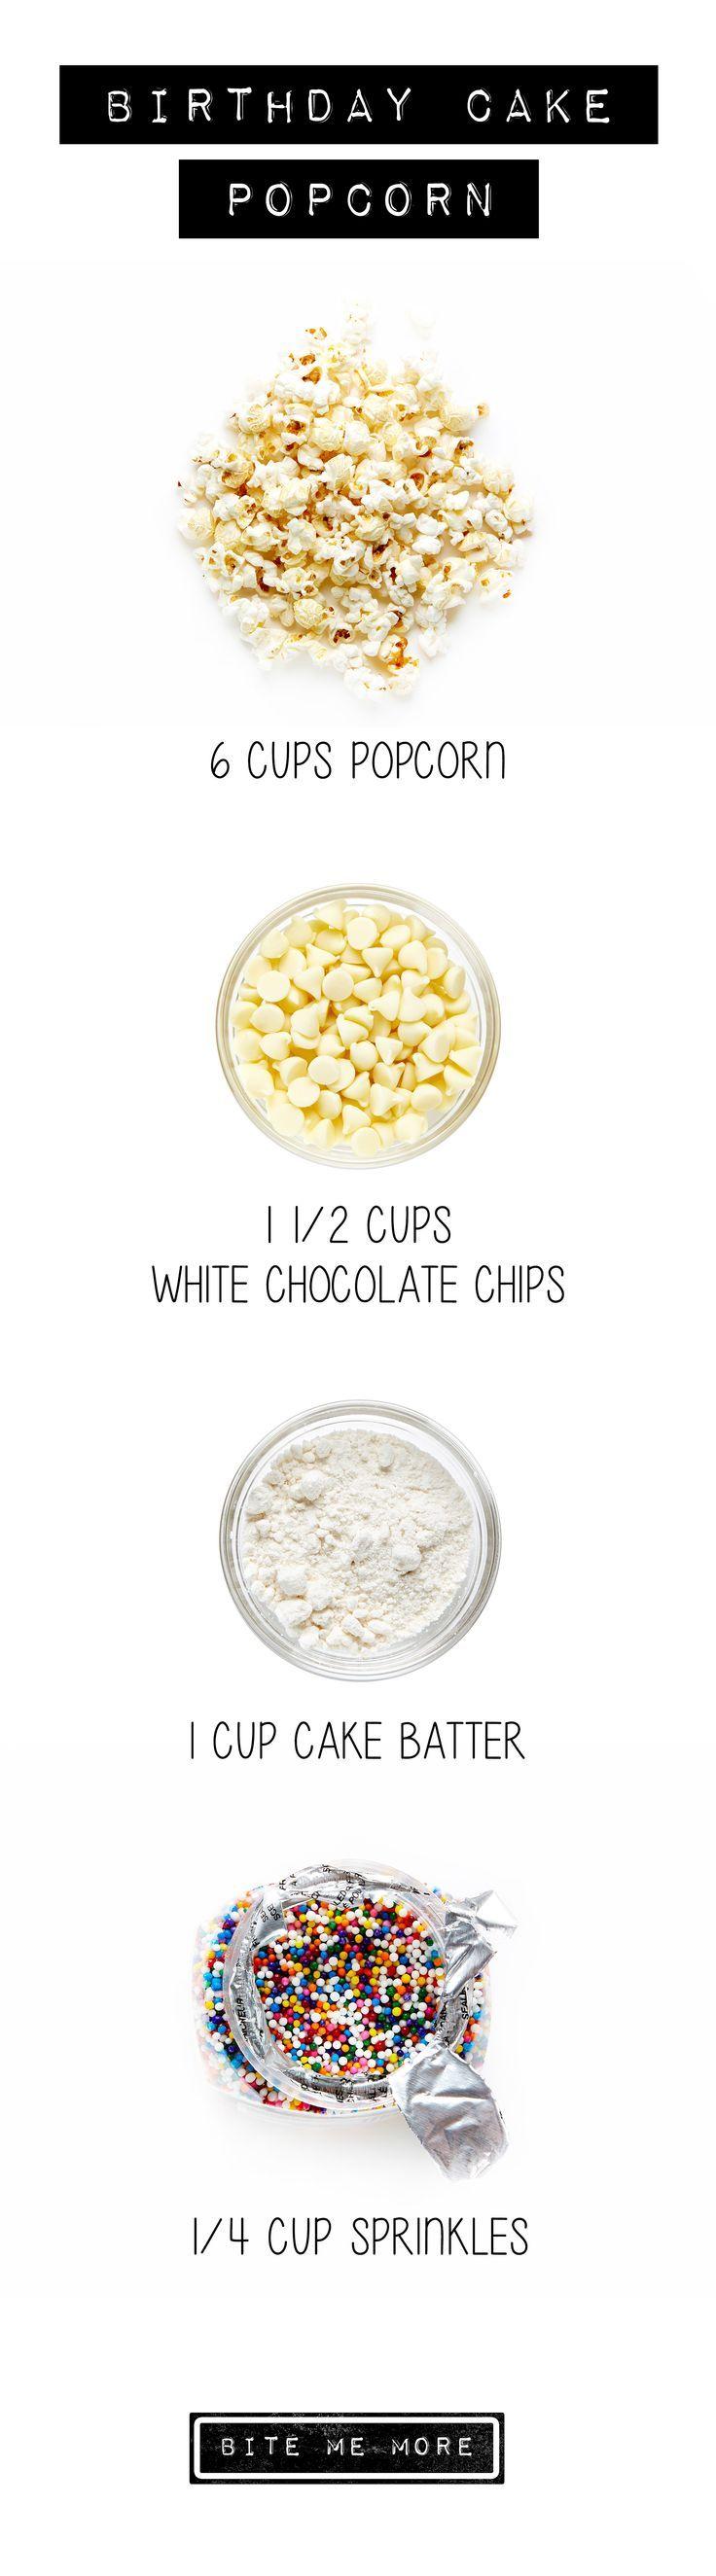 Happy Birthday, every day, thanks to this simple recipe for Birthday Cake Popcorn. #BiteMeMore #popcorn